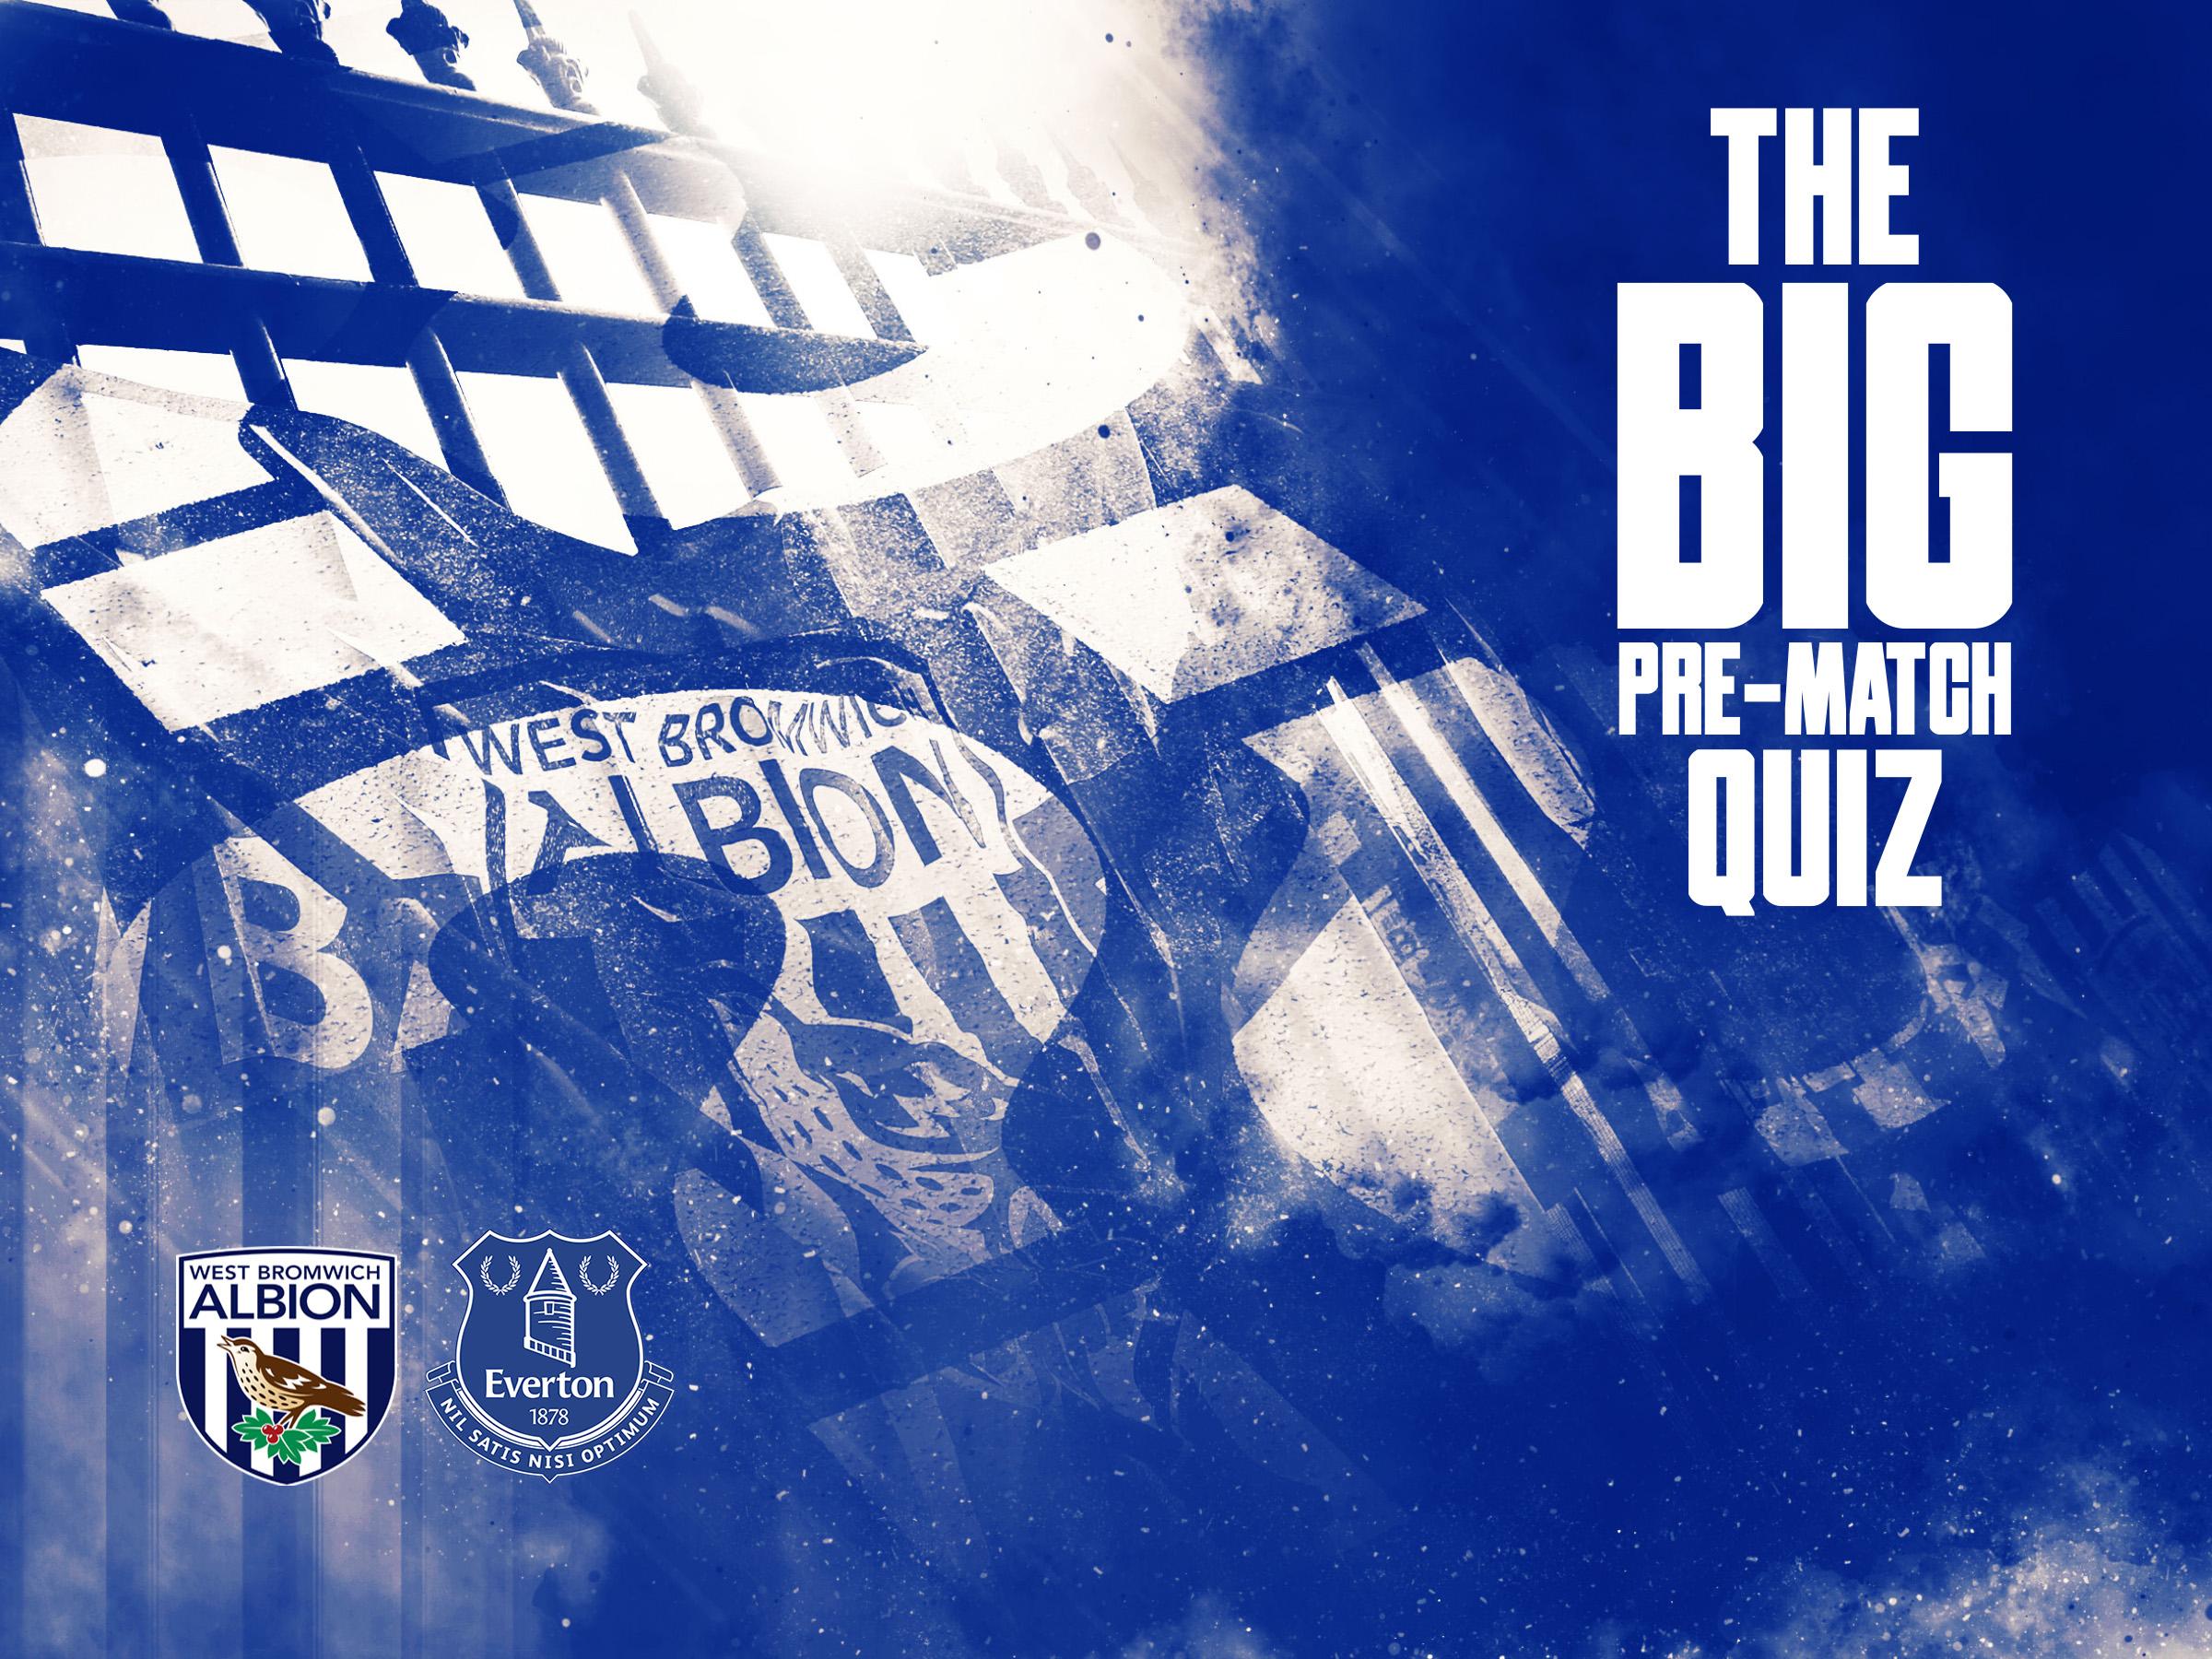 Everton pre-match quiz